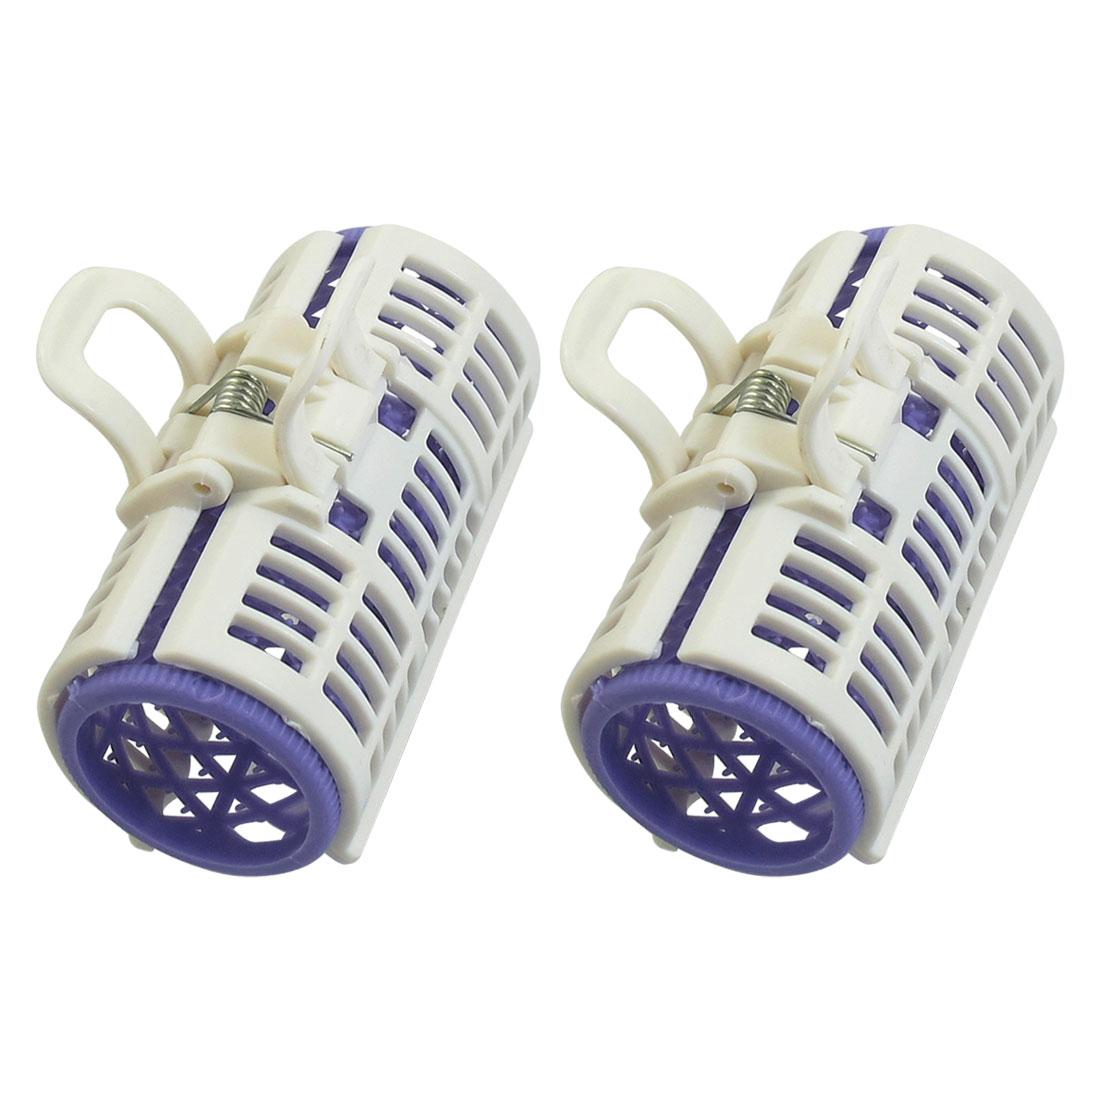 Women Home DIY Styling Plastic Hair Curler Cosmetic Roller Lavender White 2 Pcs